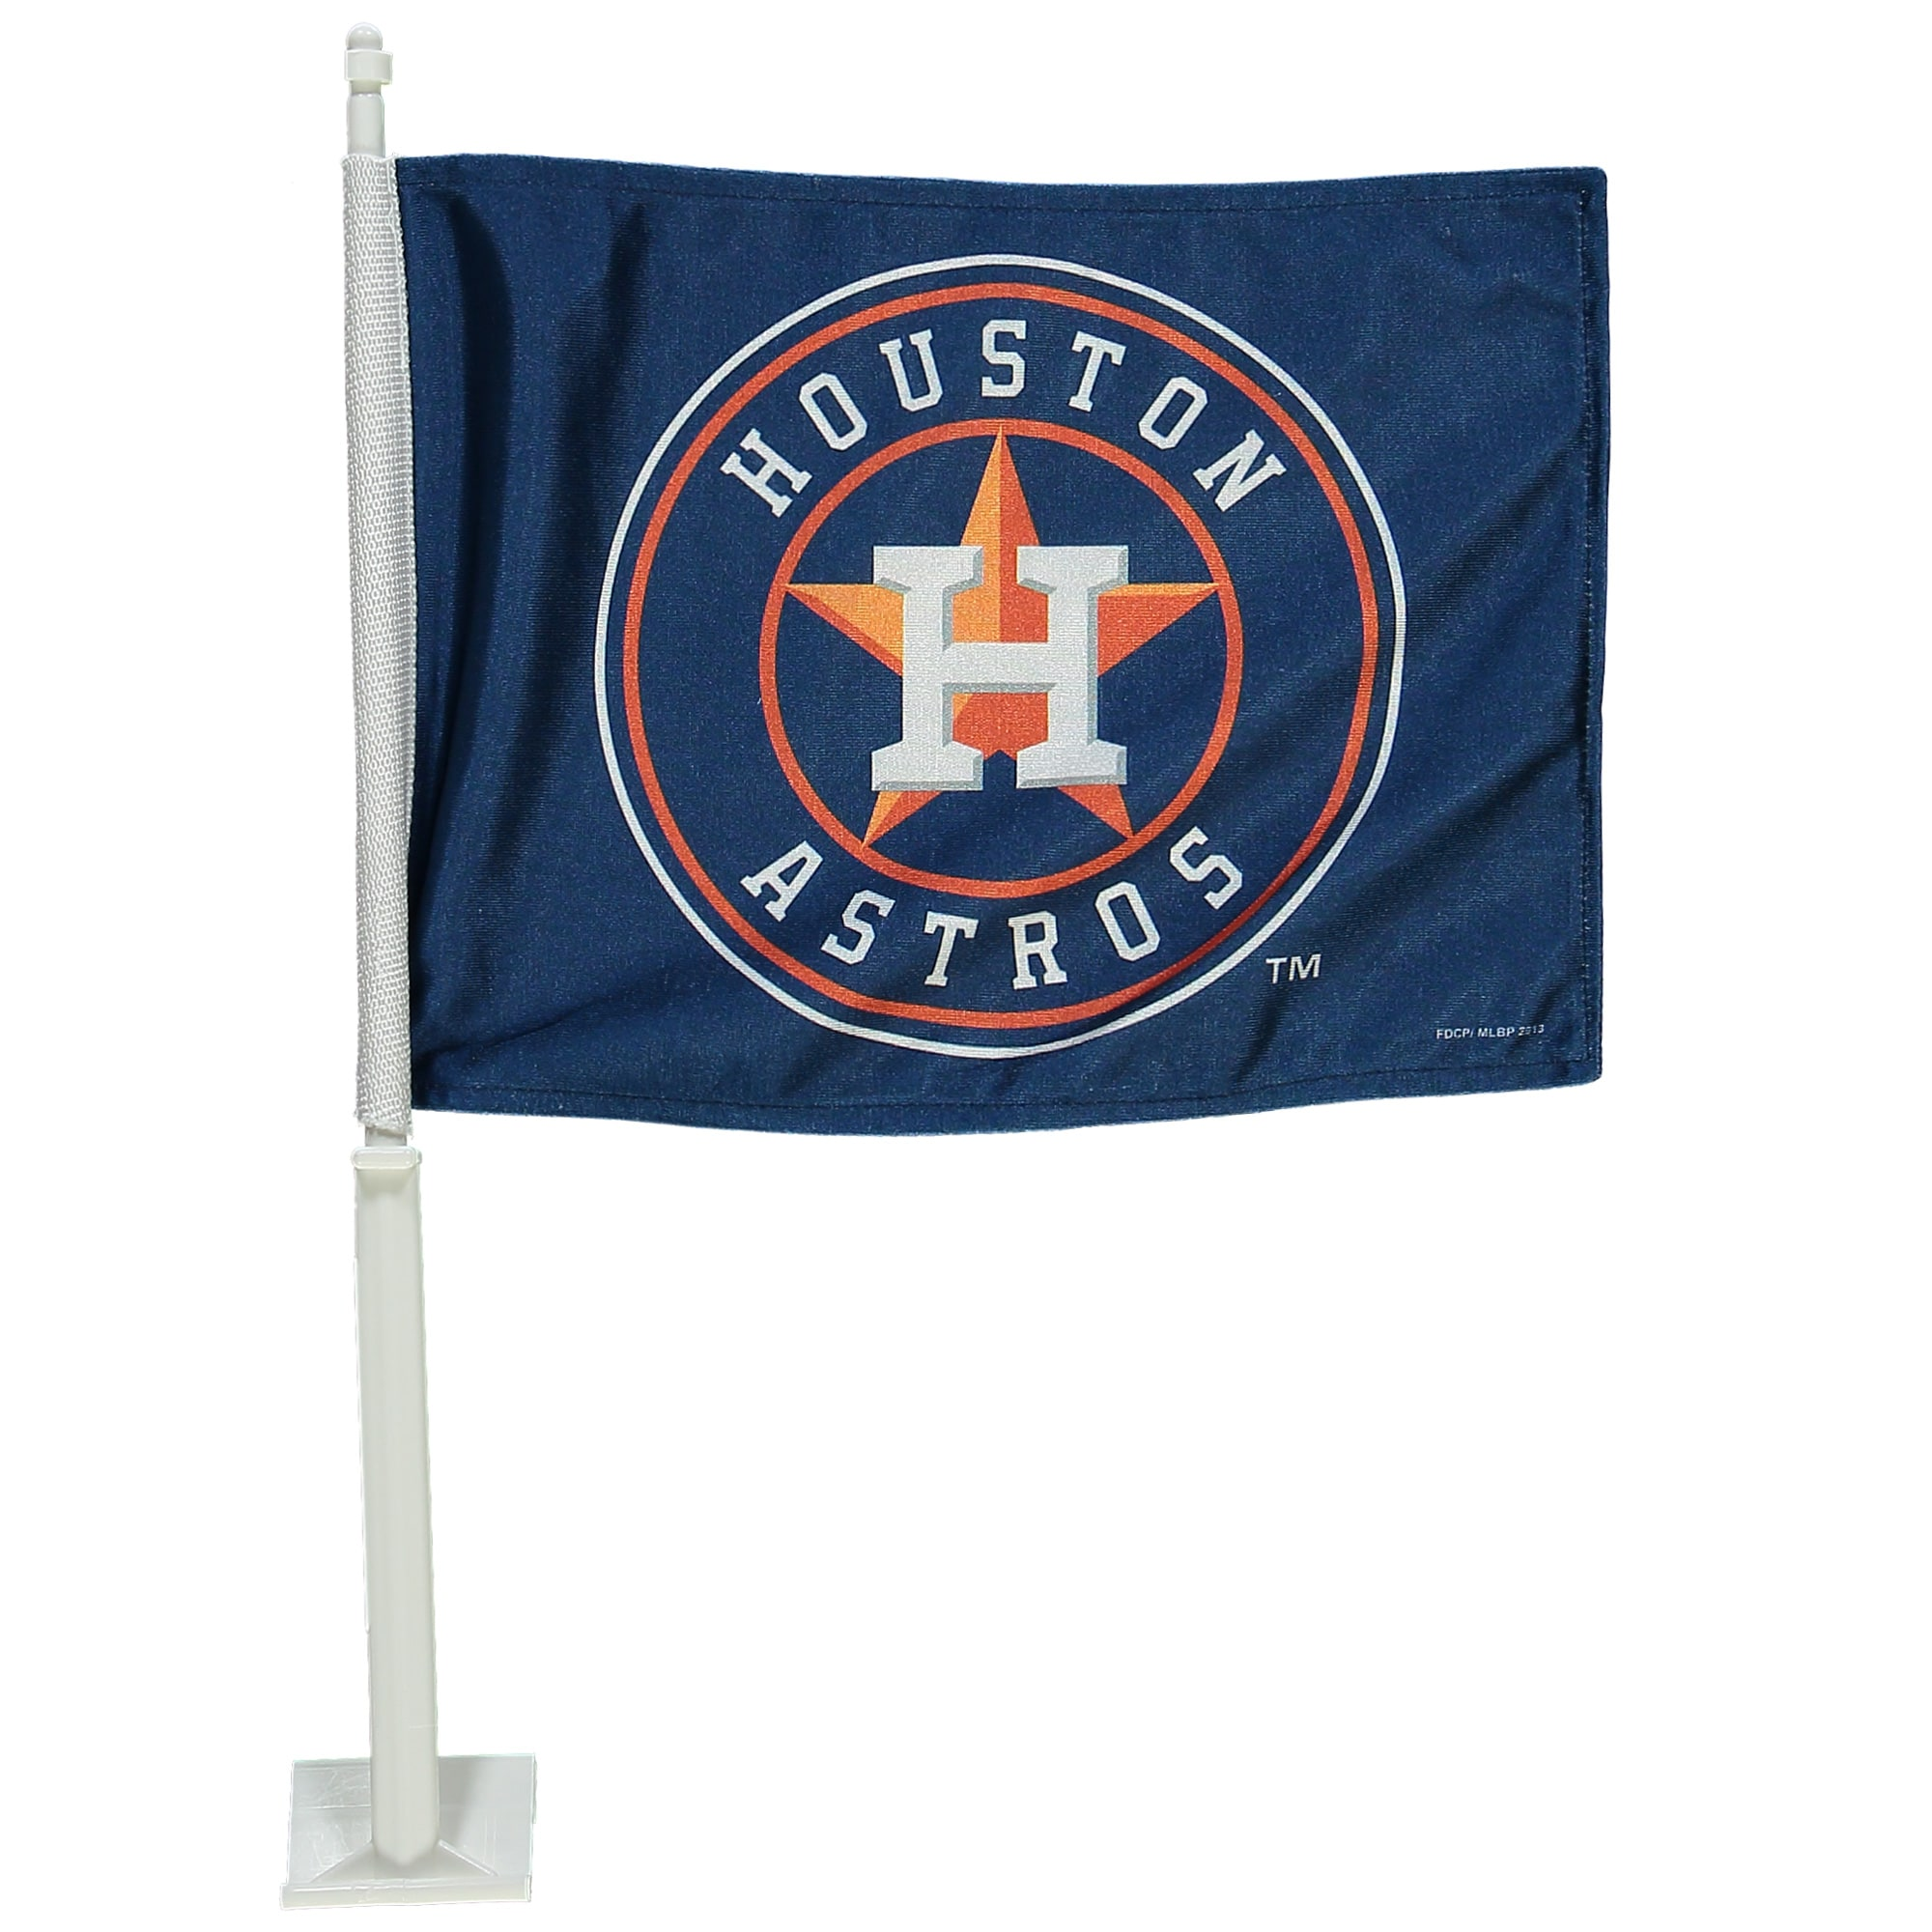 "Houston Astros 11"" x 14"" Logo Car Flag"